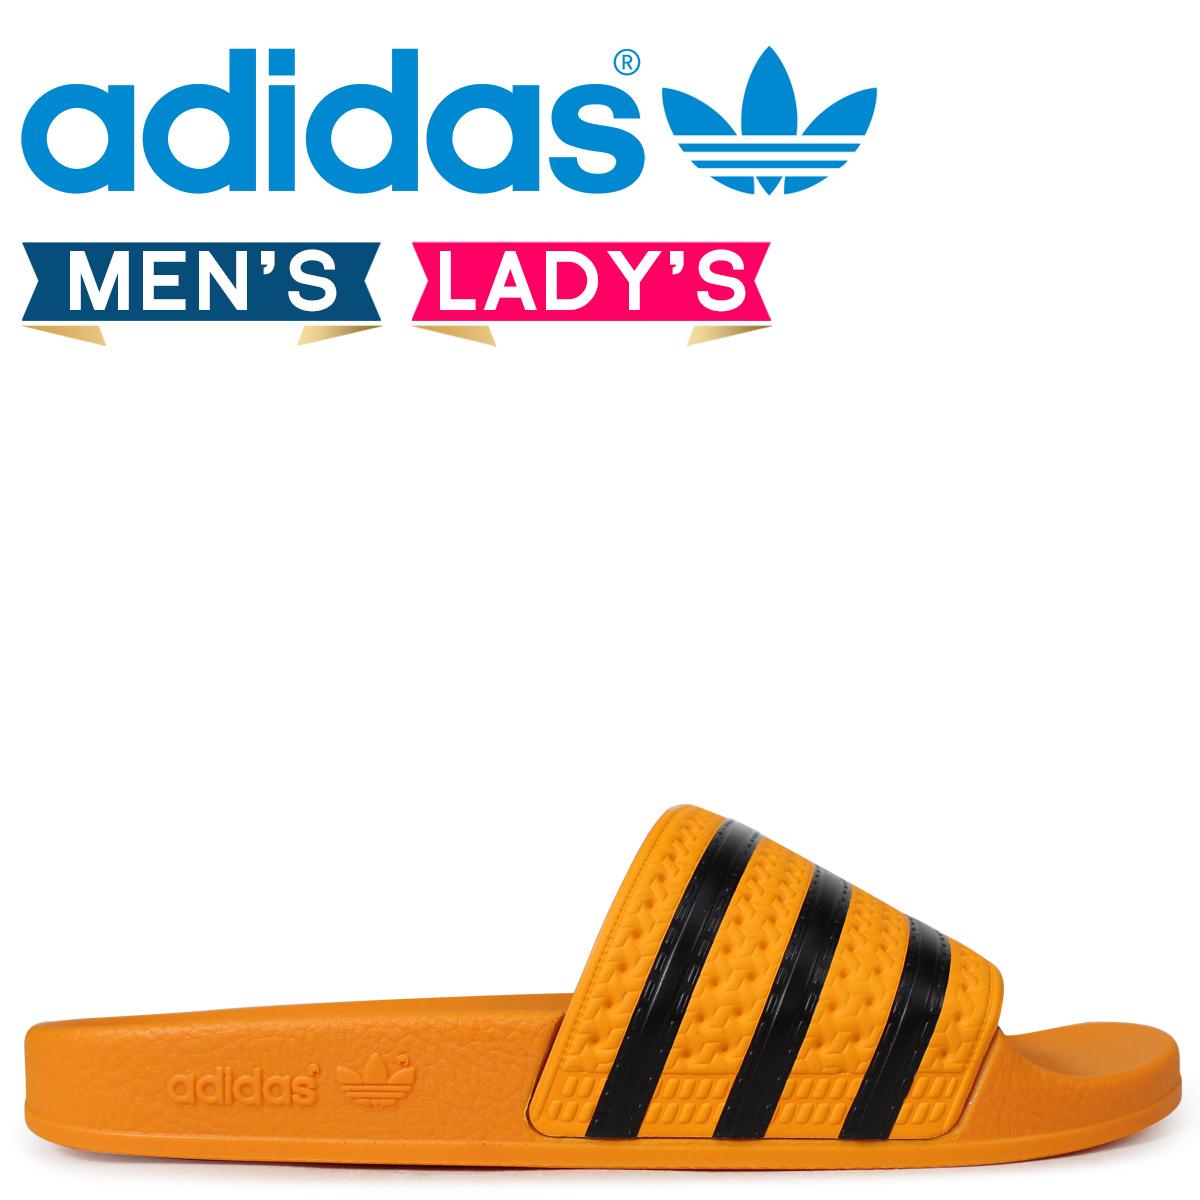 b3986b3cbc68 adidas Originals アディレッタアディダスサンダルシャワーサンダル ADILETTE men gap Dis CQ3099 gold  originals  load planned Shinnyu load in reservation product ...